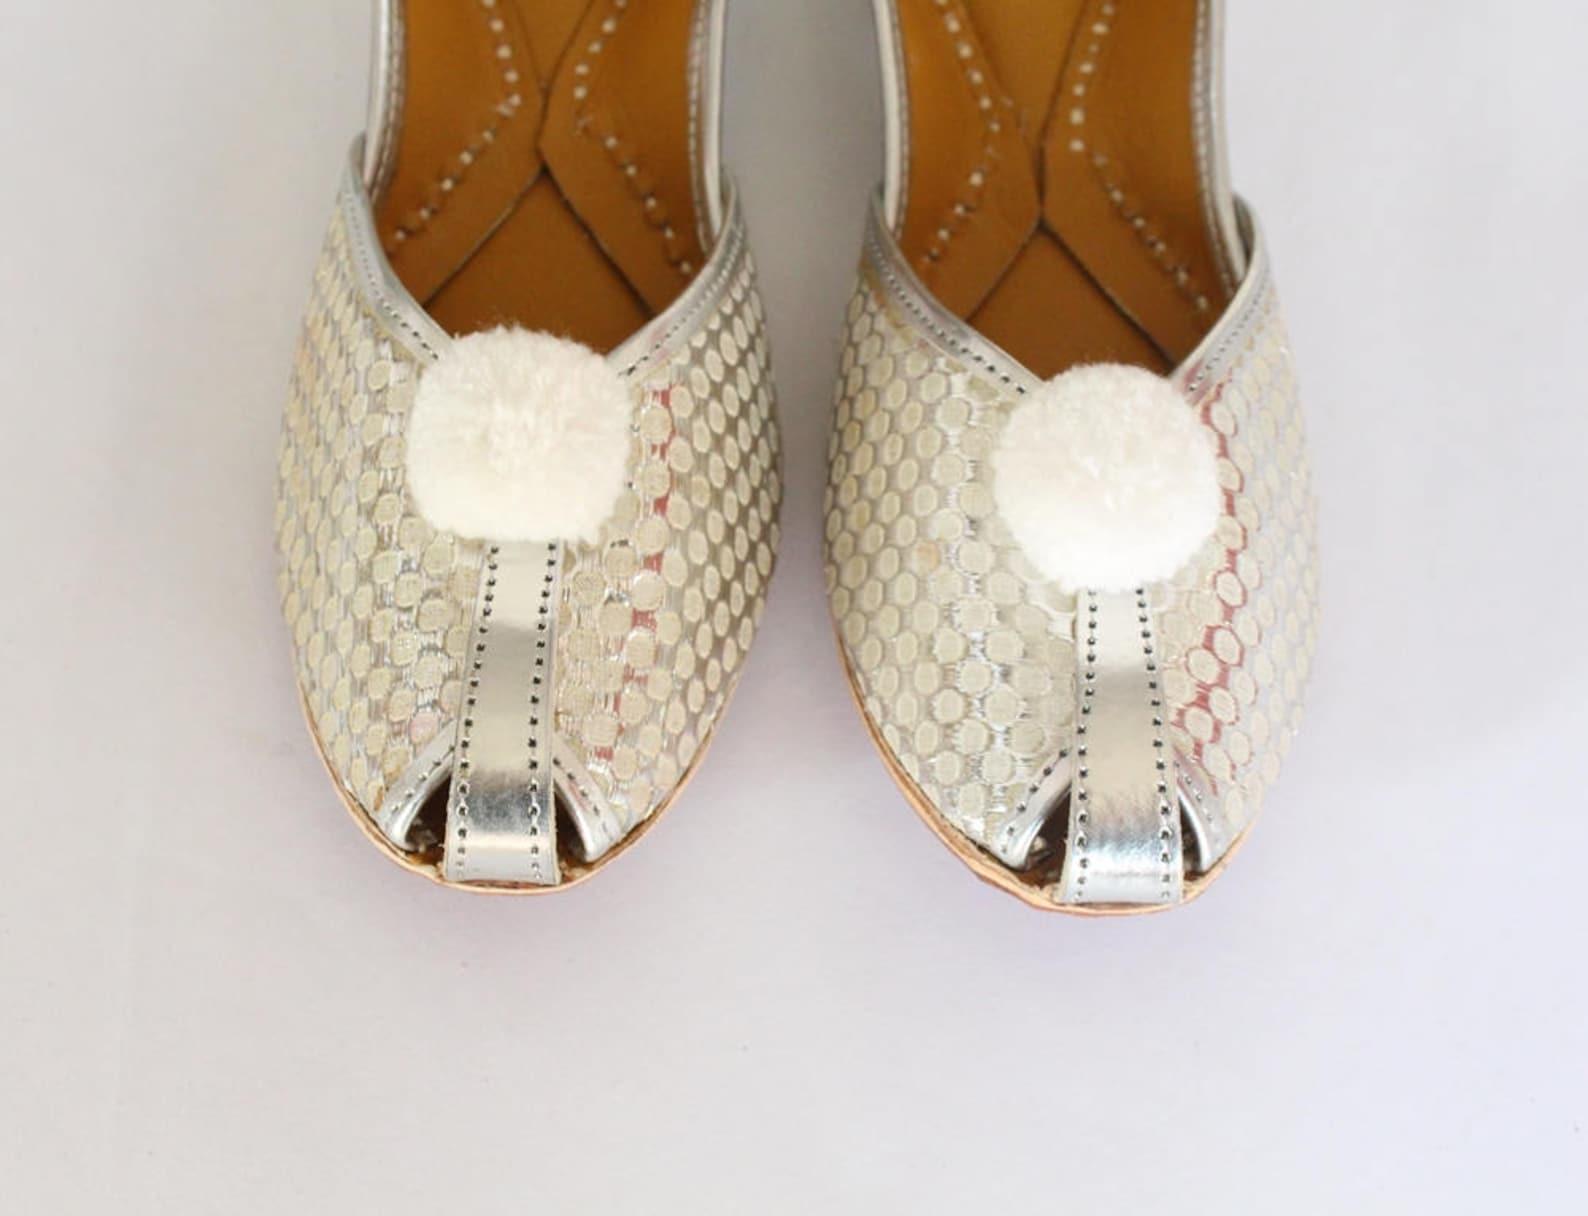 women bridal shoes/indian silver jutti shoes/silver wedding flats/silver laddu ballet flats/jasmine shoes/khussa shoes us size 5